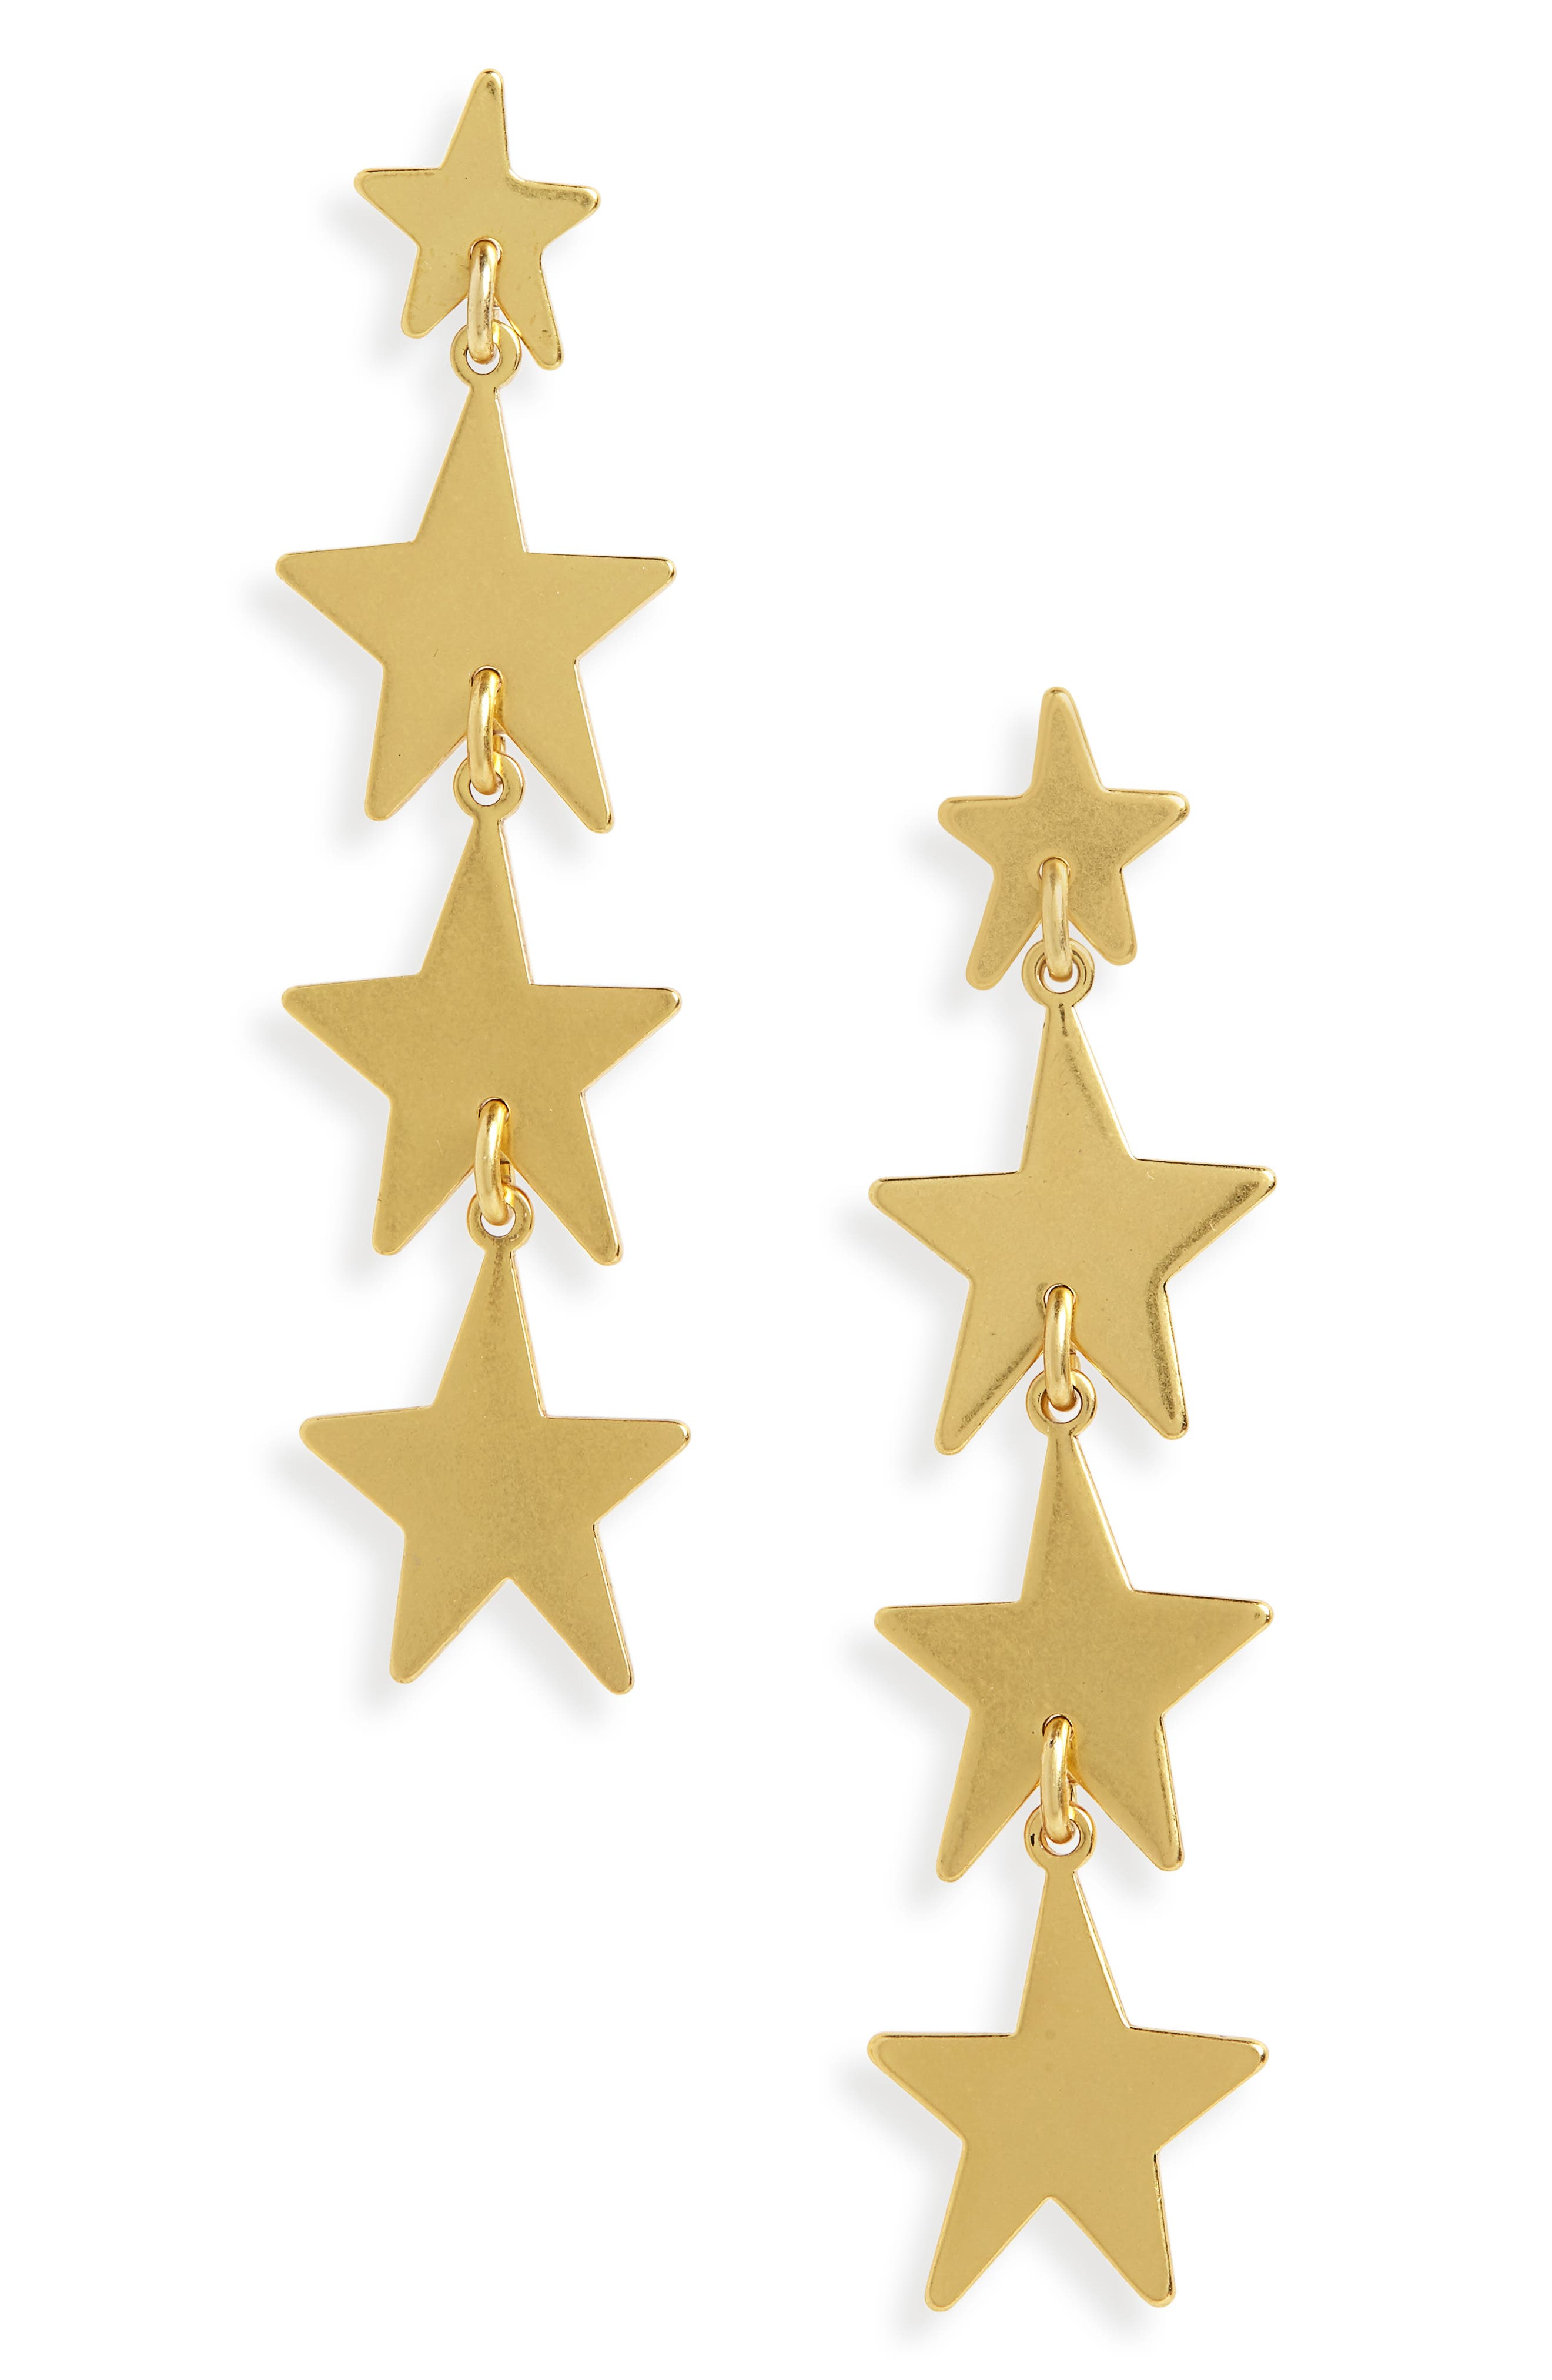 Star Drop Earrings,                             Main thumbnail 1, color,                             VINTAGE GOLD